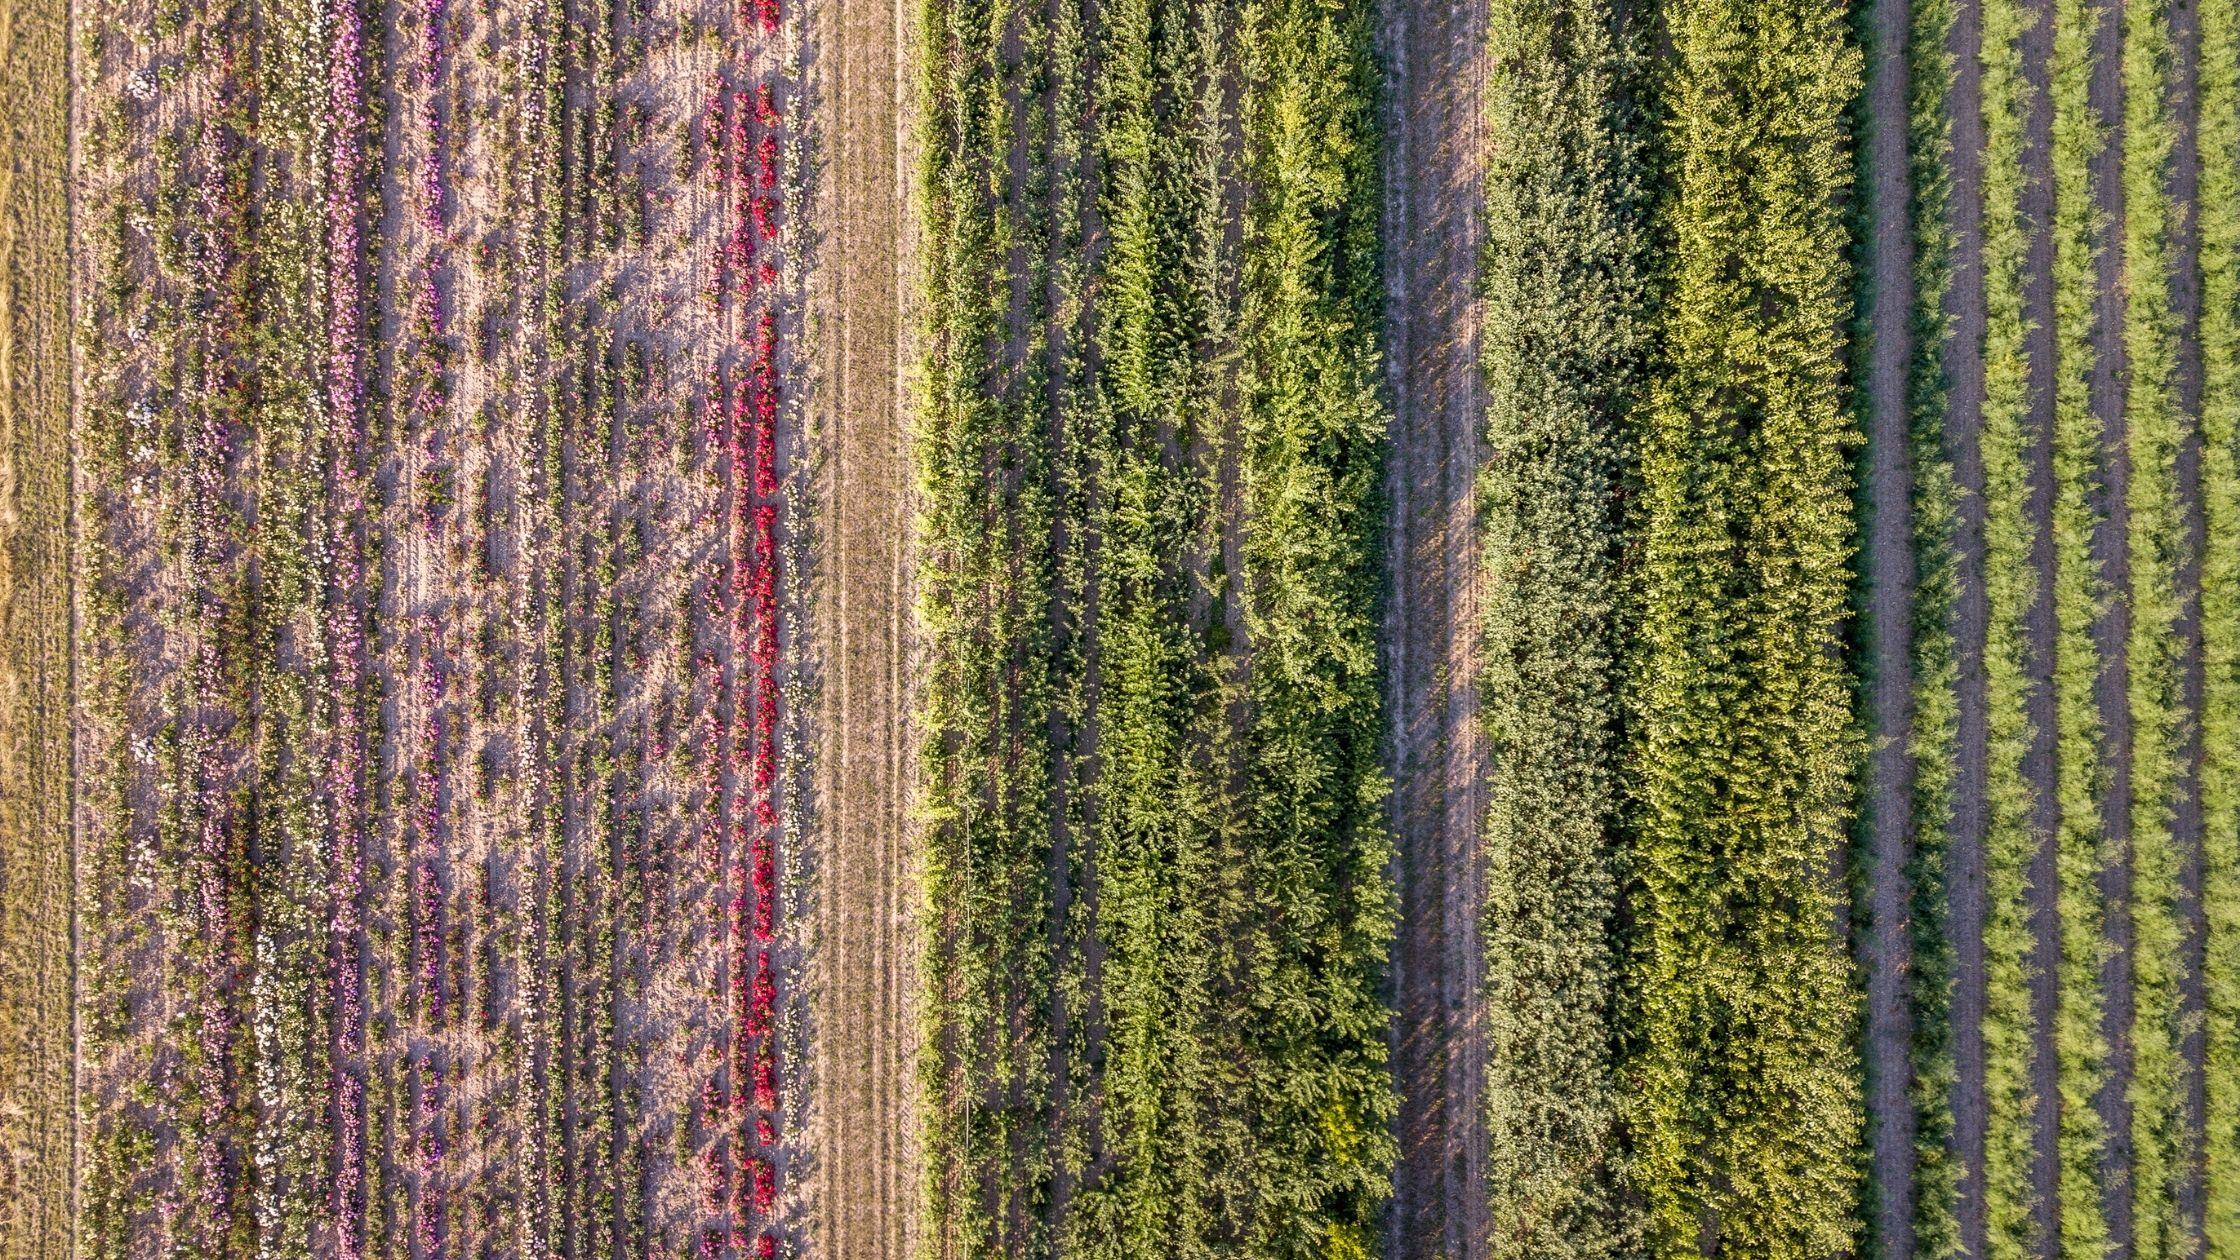 Biodiversity, Planetary Health, and Food